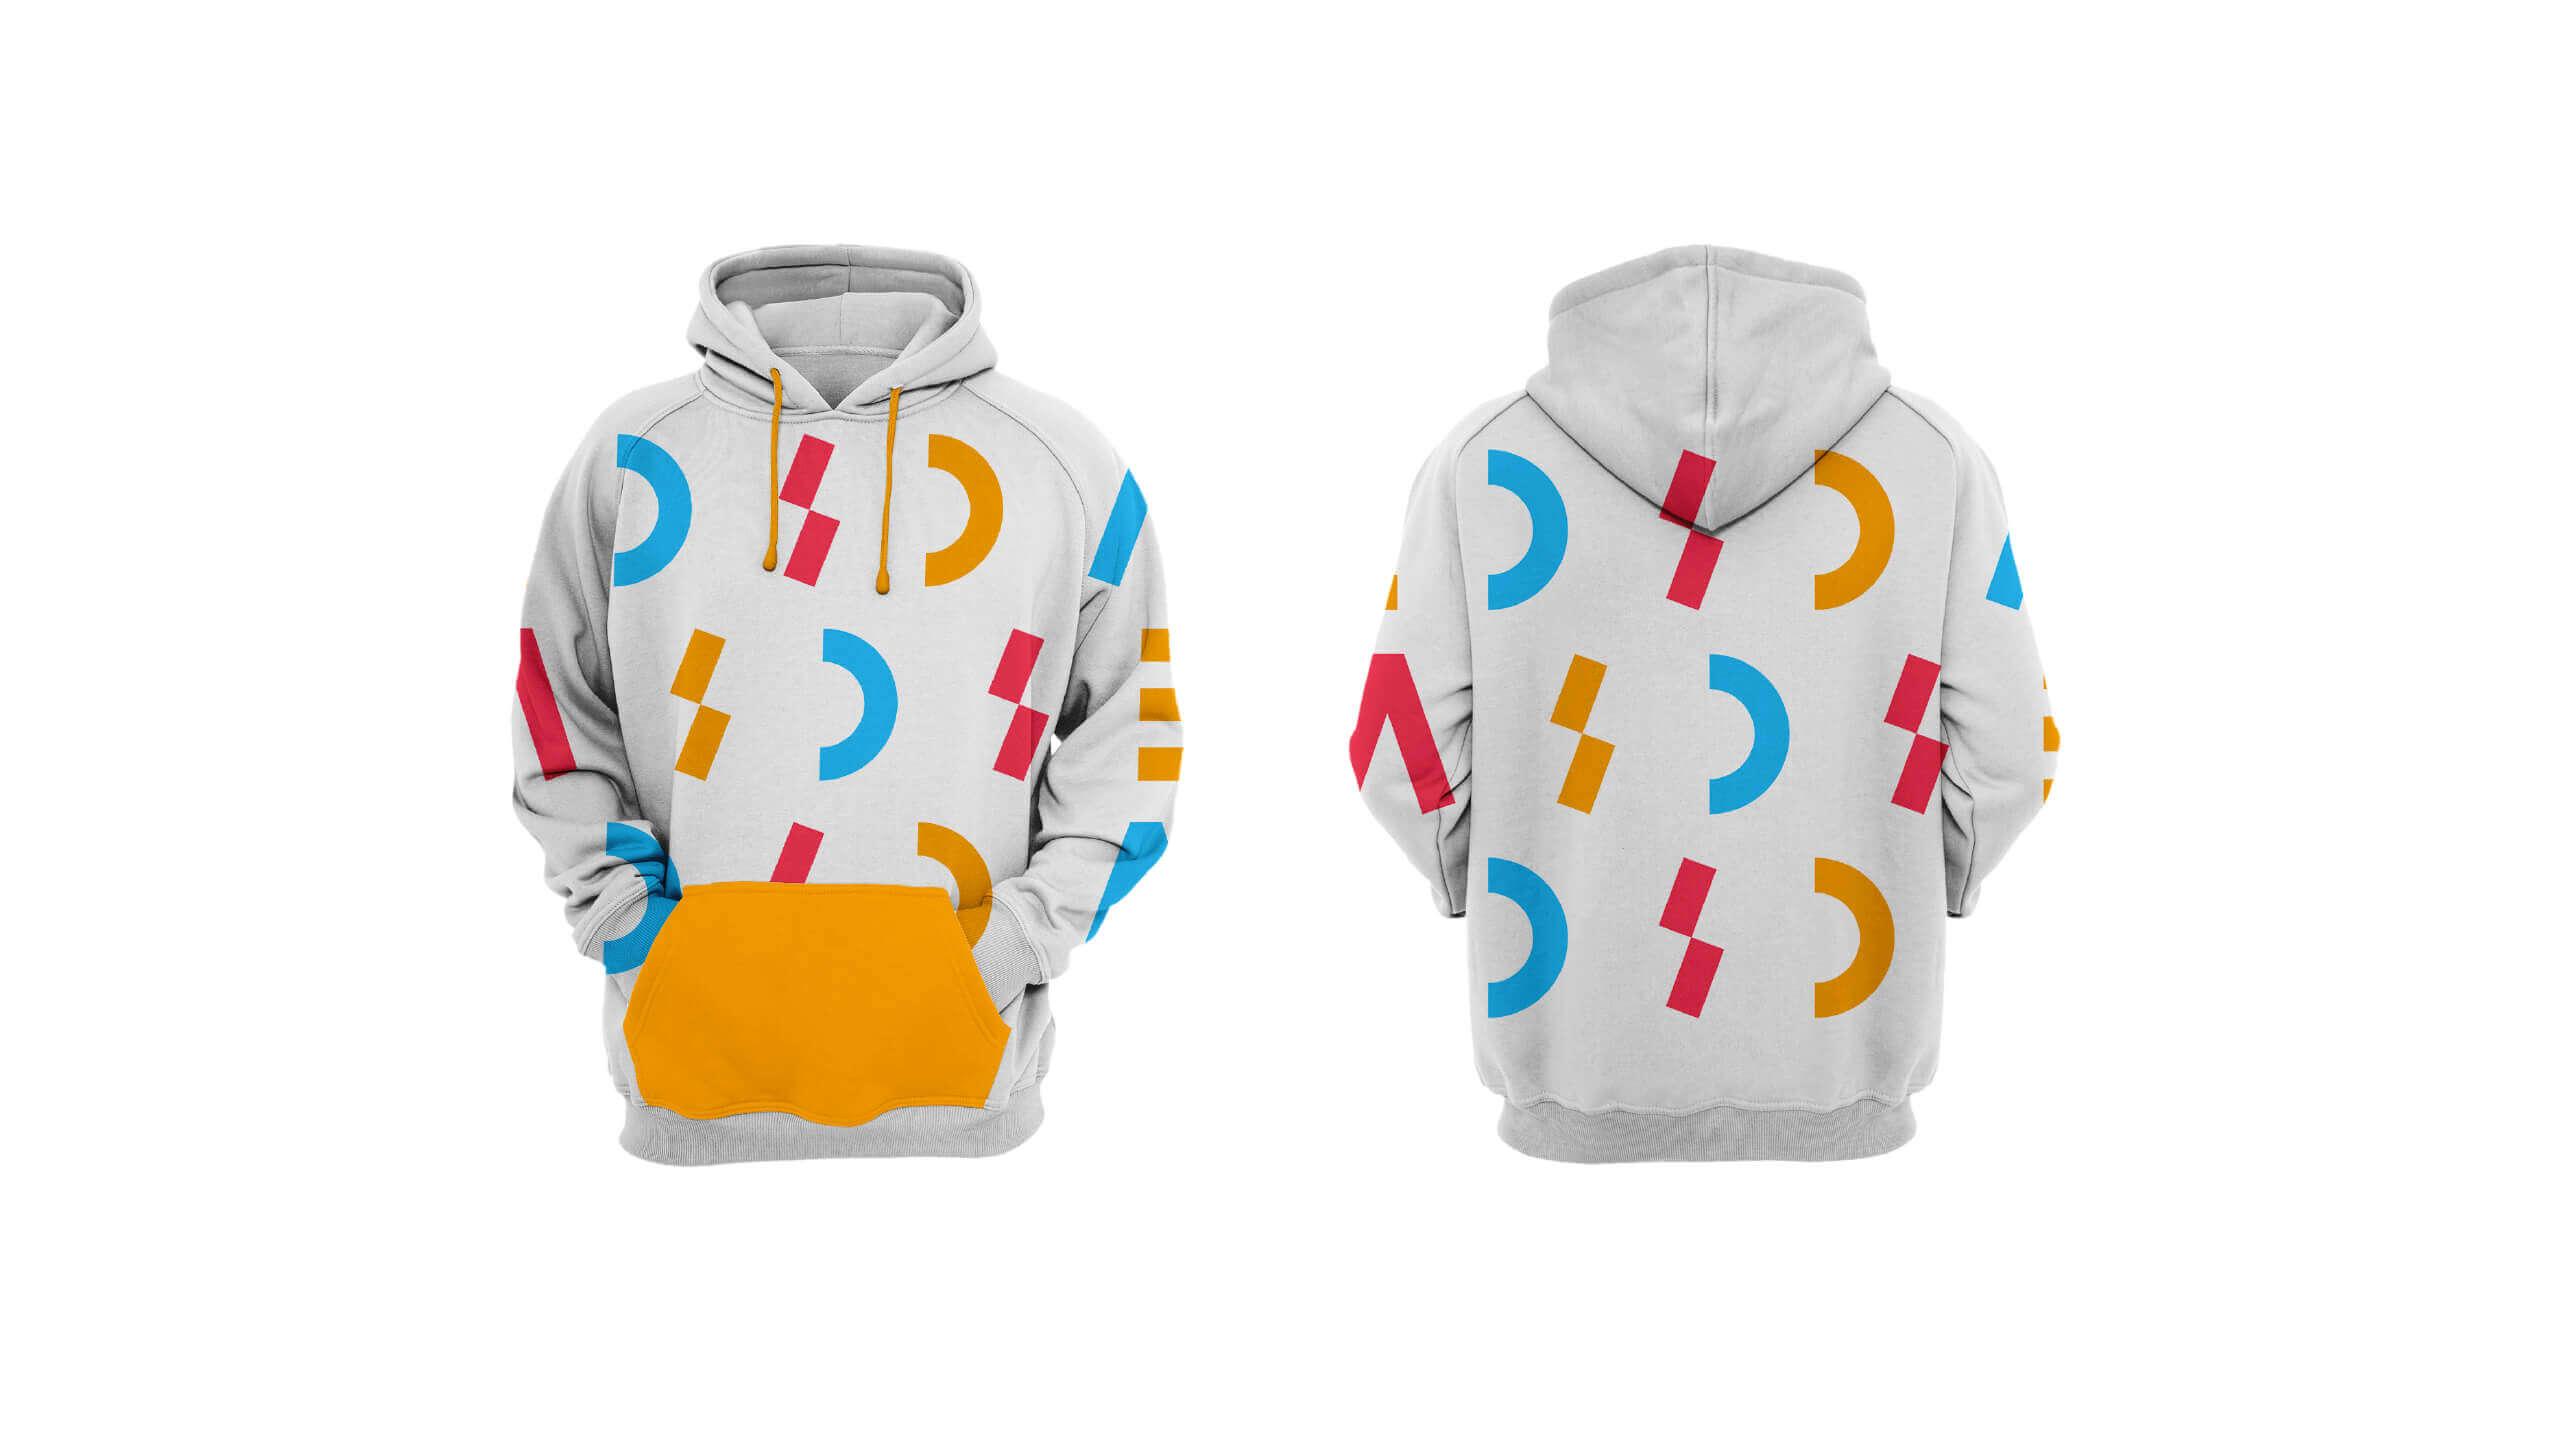 goodies hoodies de l'esadd